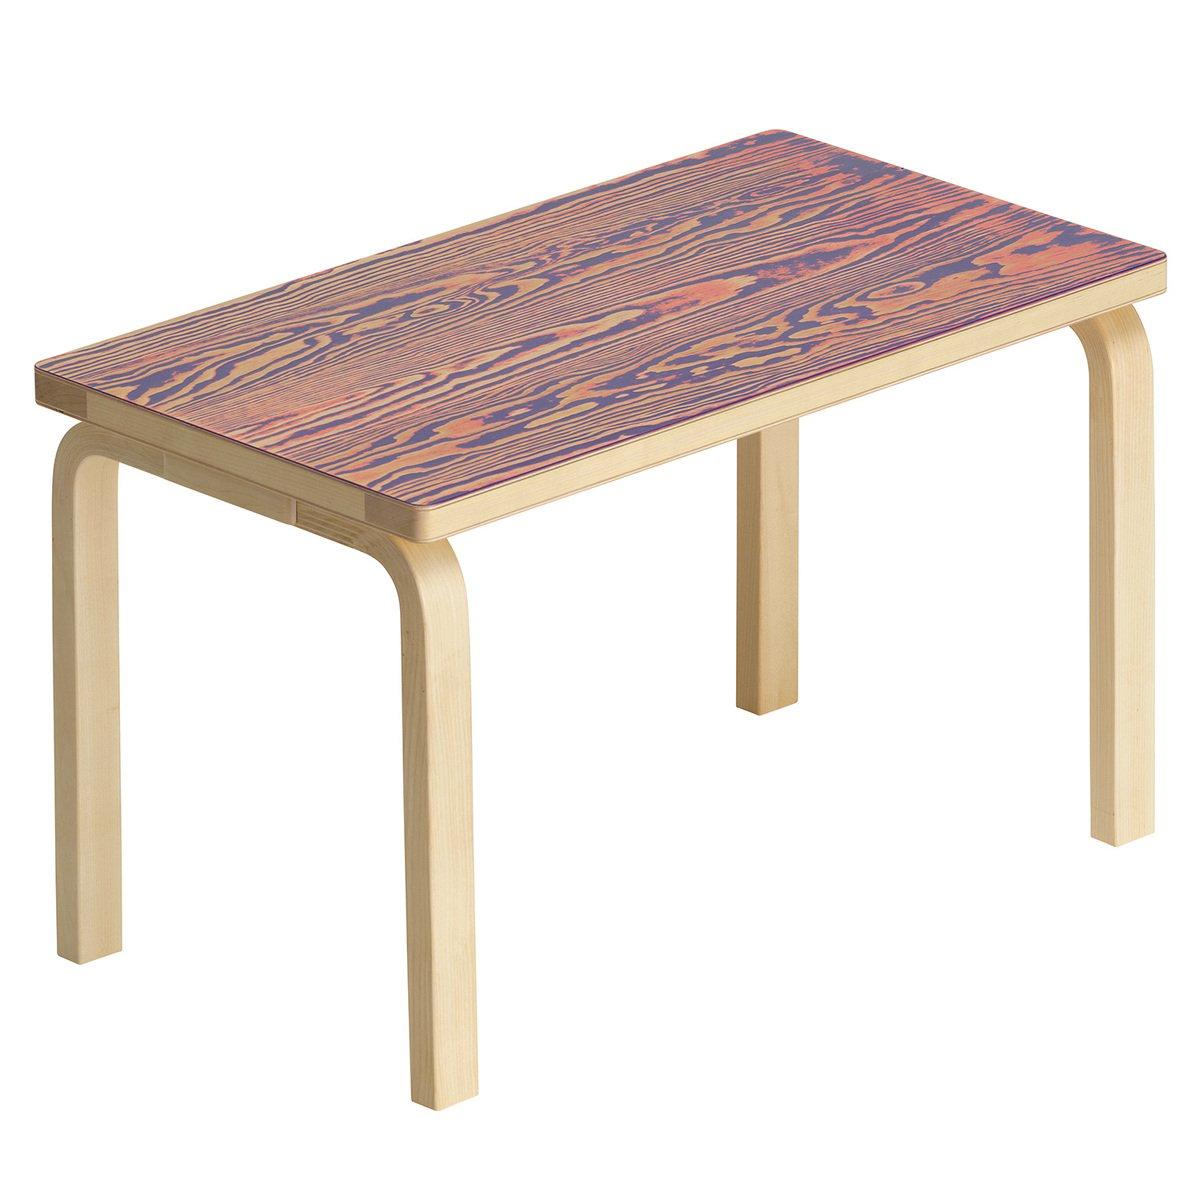 Remarkable Artek Aalto Bench 153B Coloring Pink Purple Finnish Machost Co Dining Chair Design Ideas Machostcouk